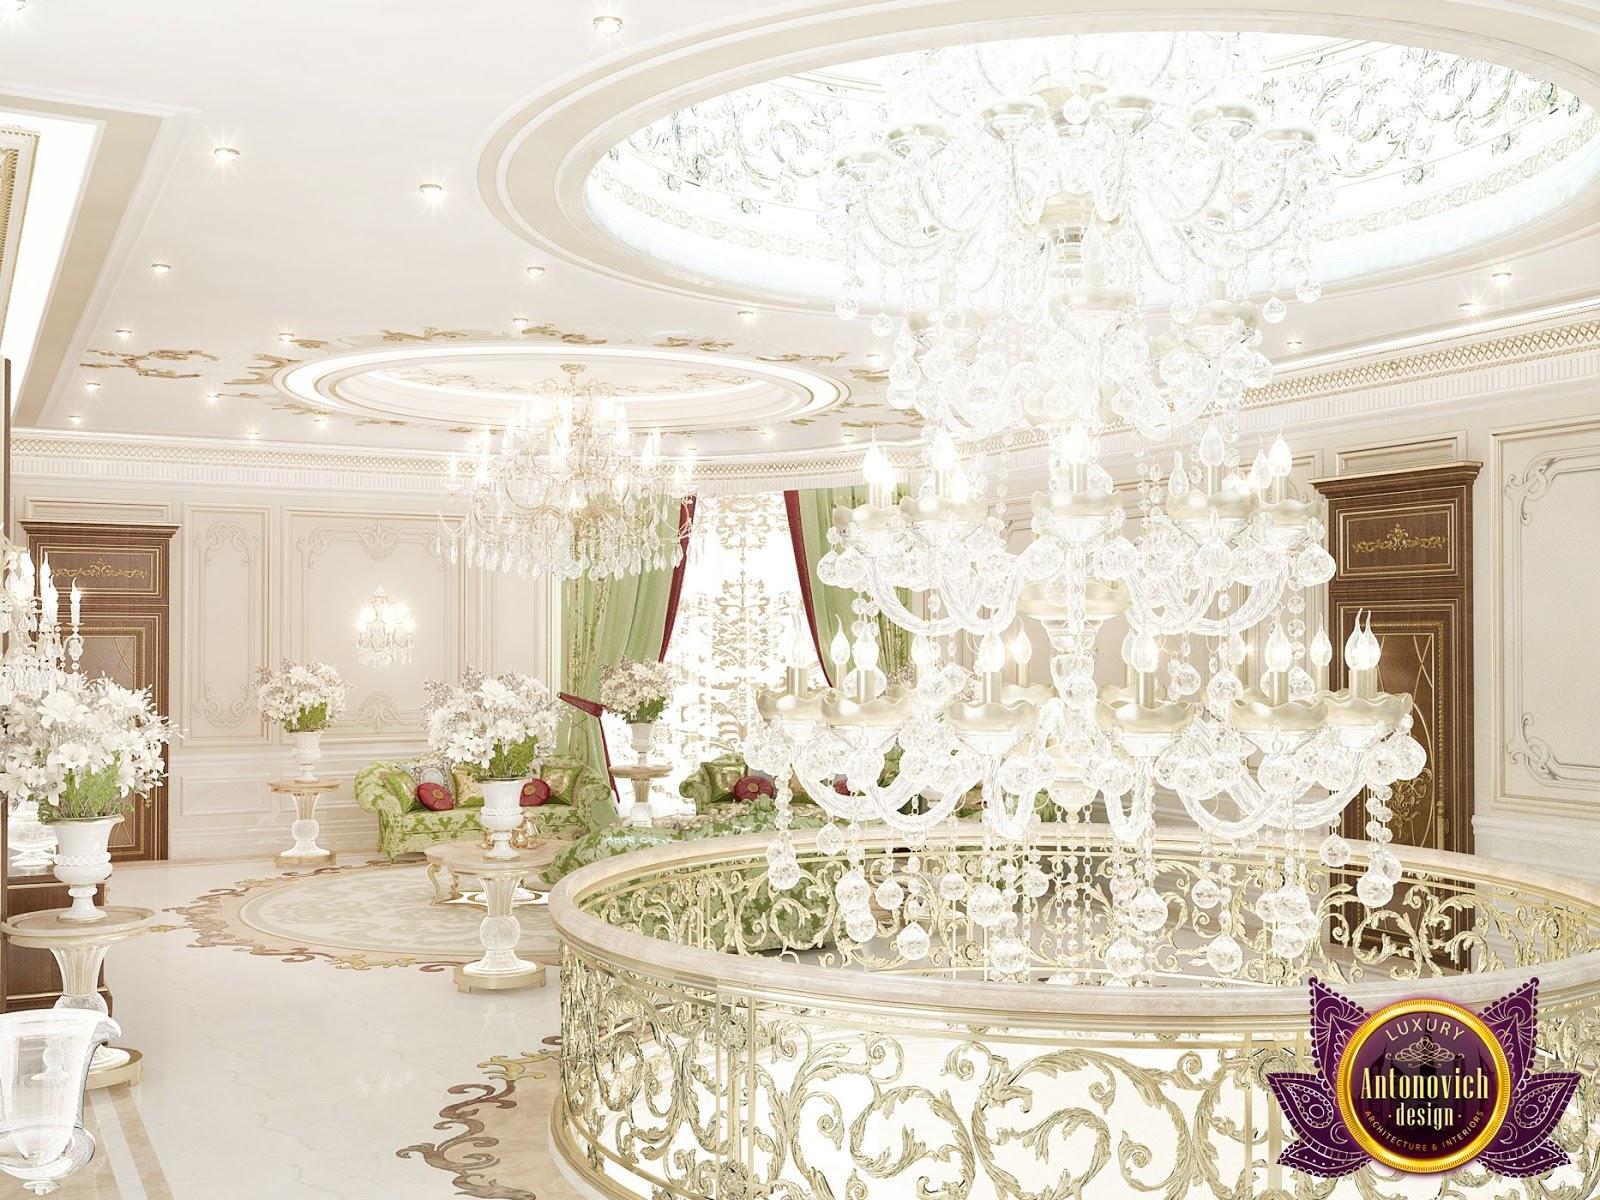 Kitchen Design Usa By Katrina Antonovich: Kenyadesign: Luxury Interior Design House Of Katrina